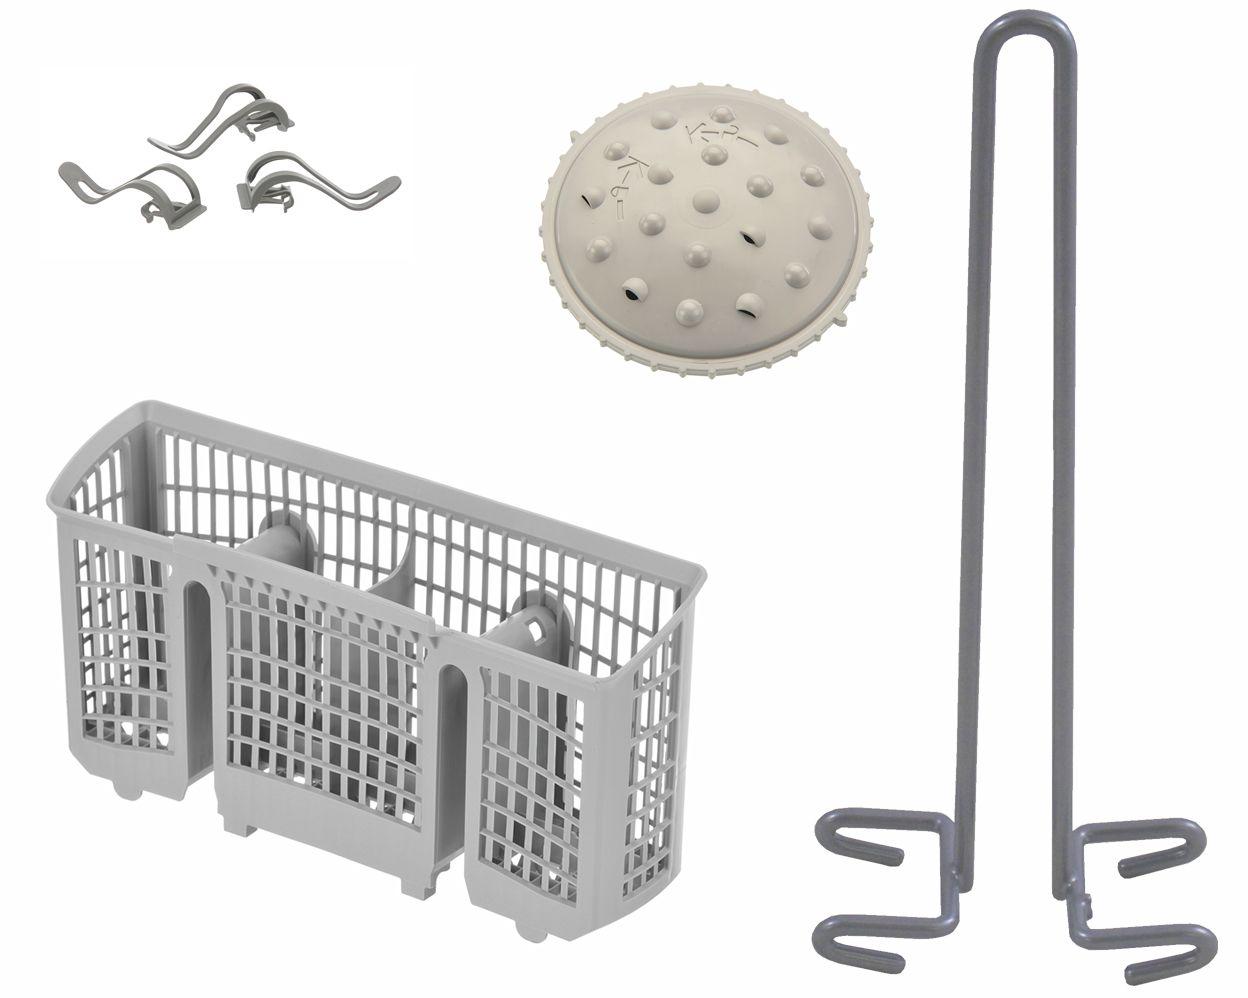 Bosch Dishwasher Accessory Kit SGZ1052UC Abt